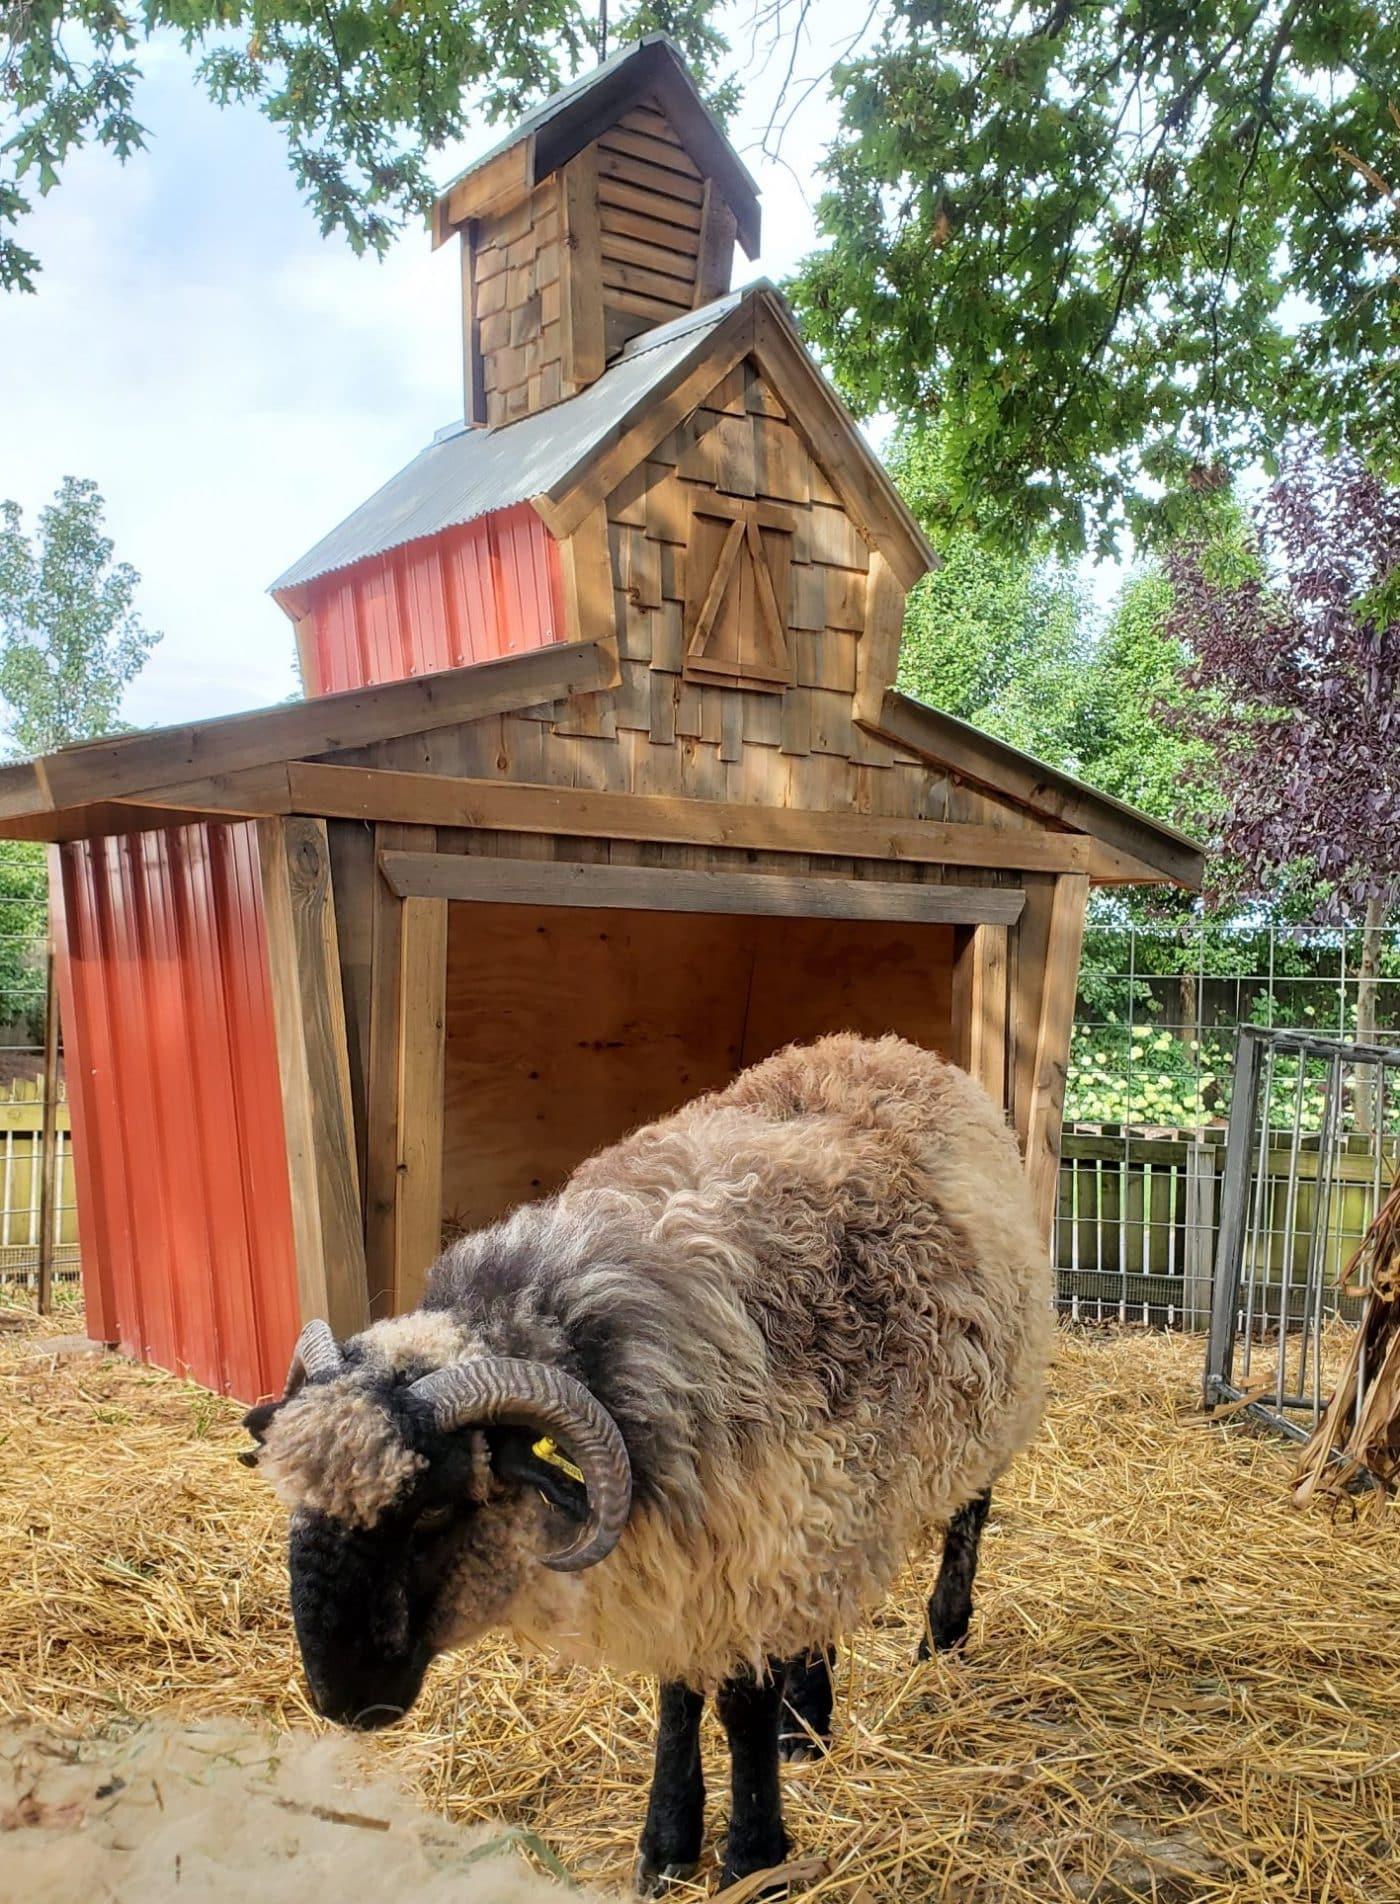 Scottish Highland Blackface Sheep at Bengtson Farm